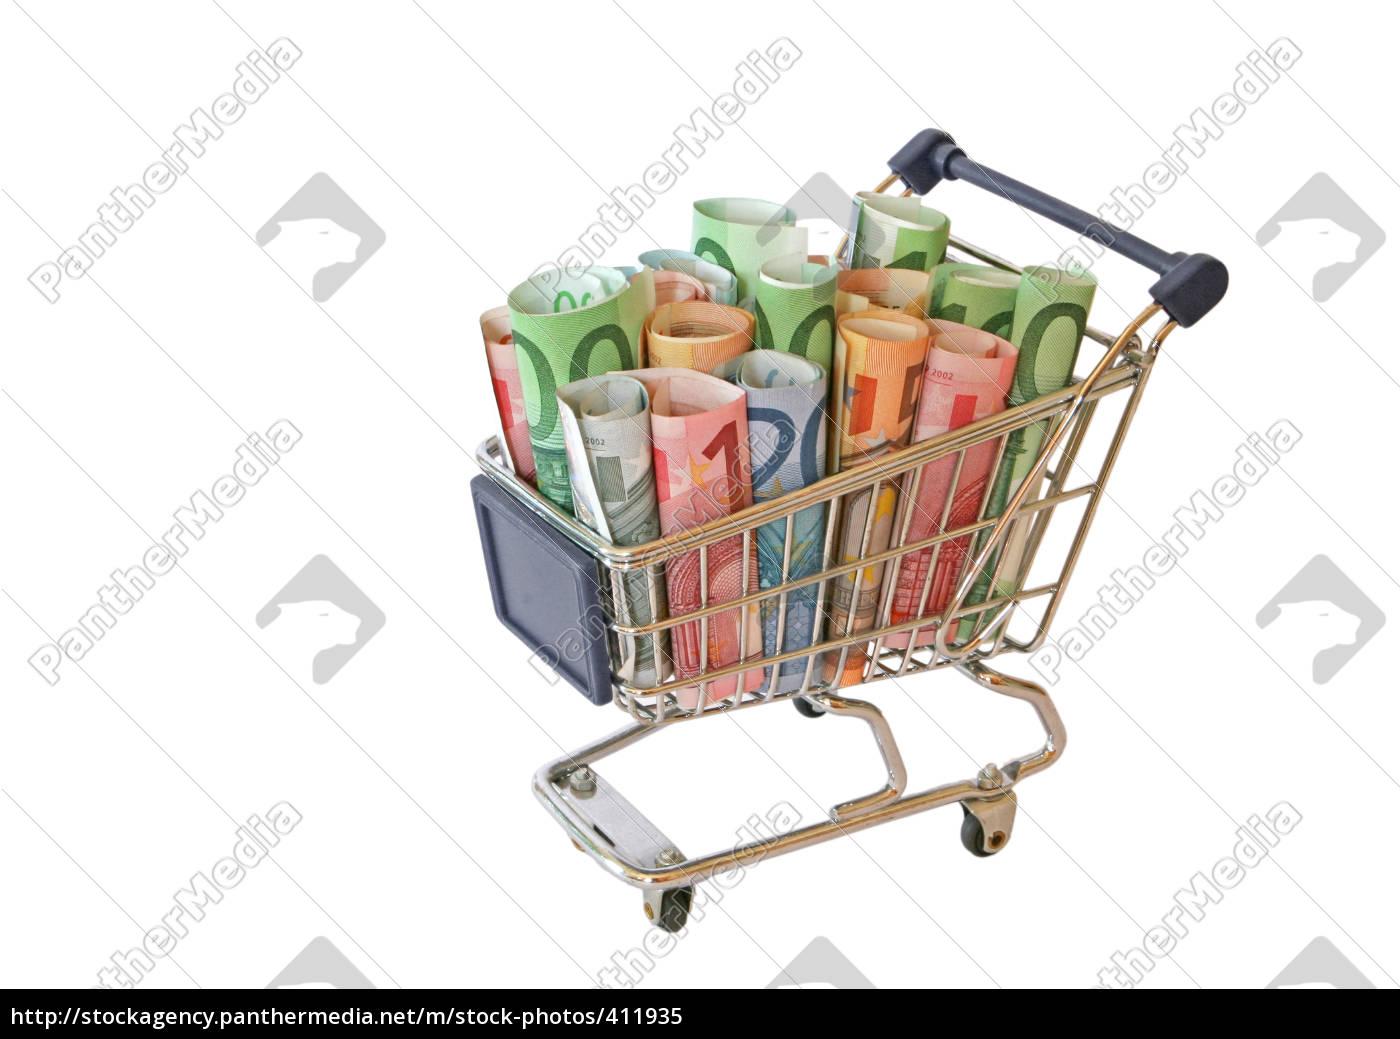 bargain - 411935